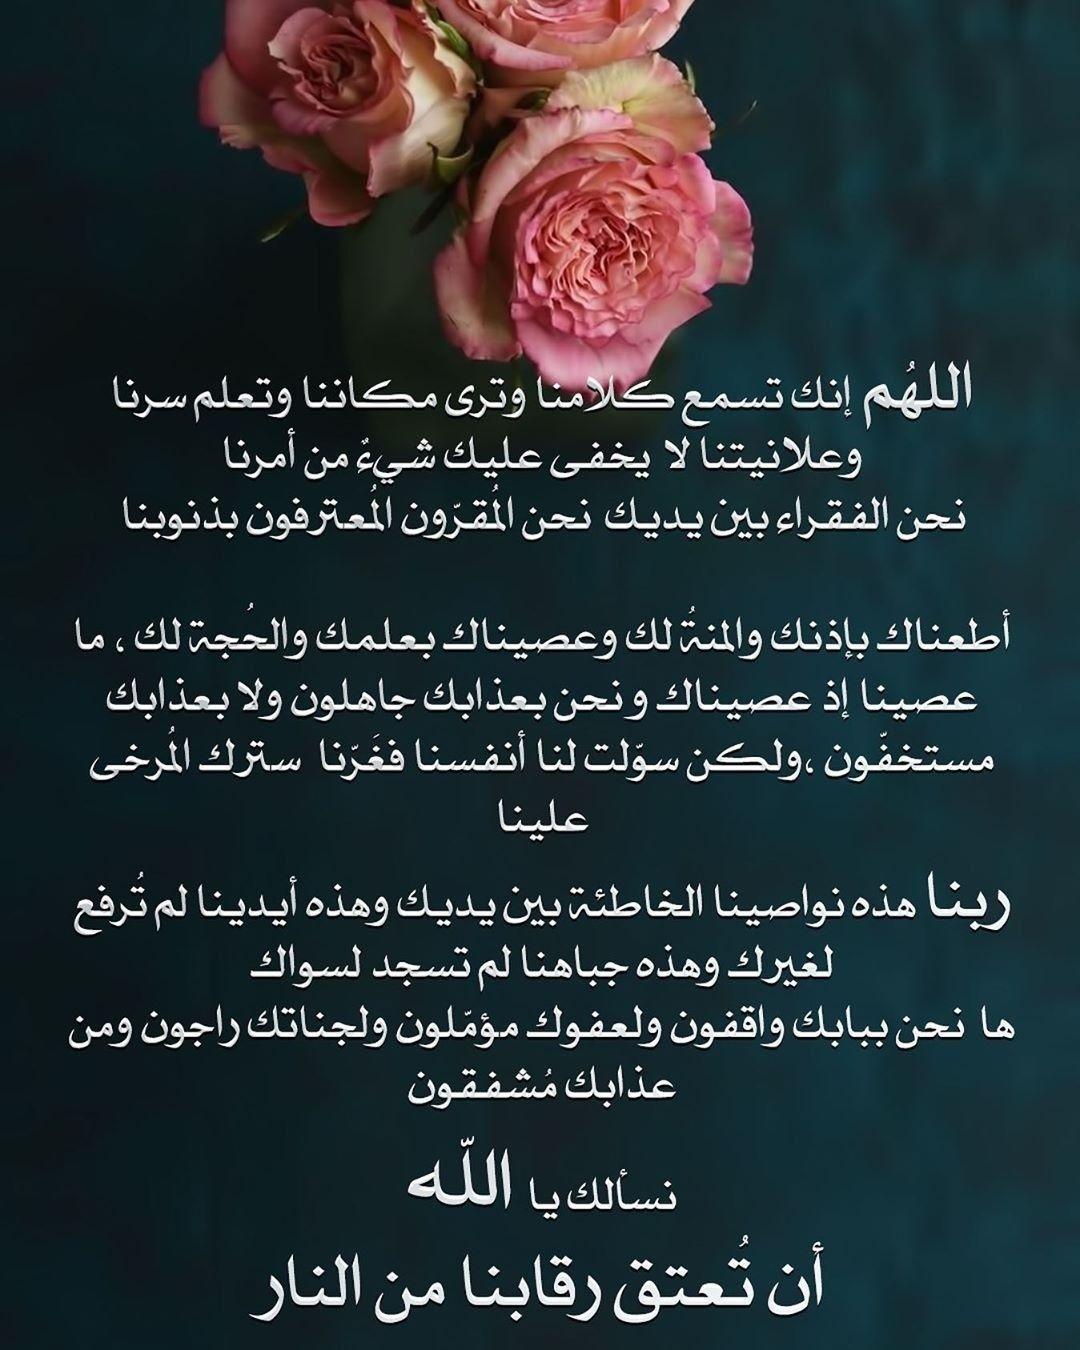 Pin By عبق الورد On أدعيه وأذكار Words Quotes Ramadan Words